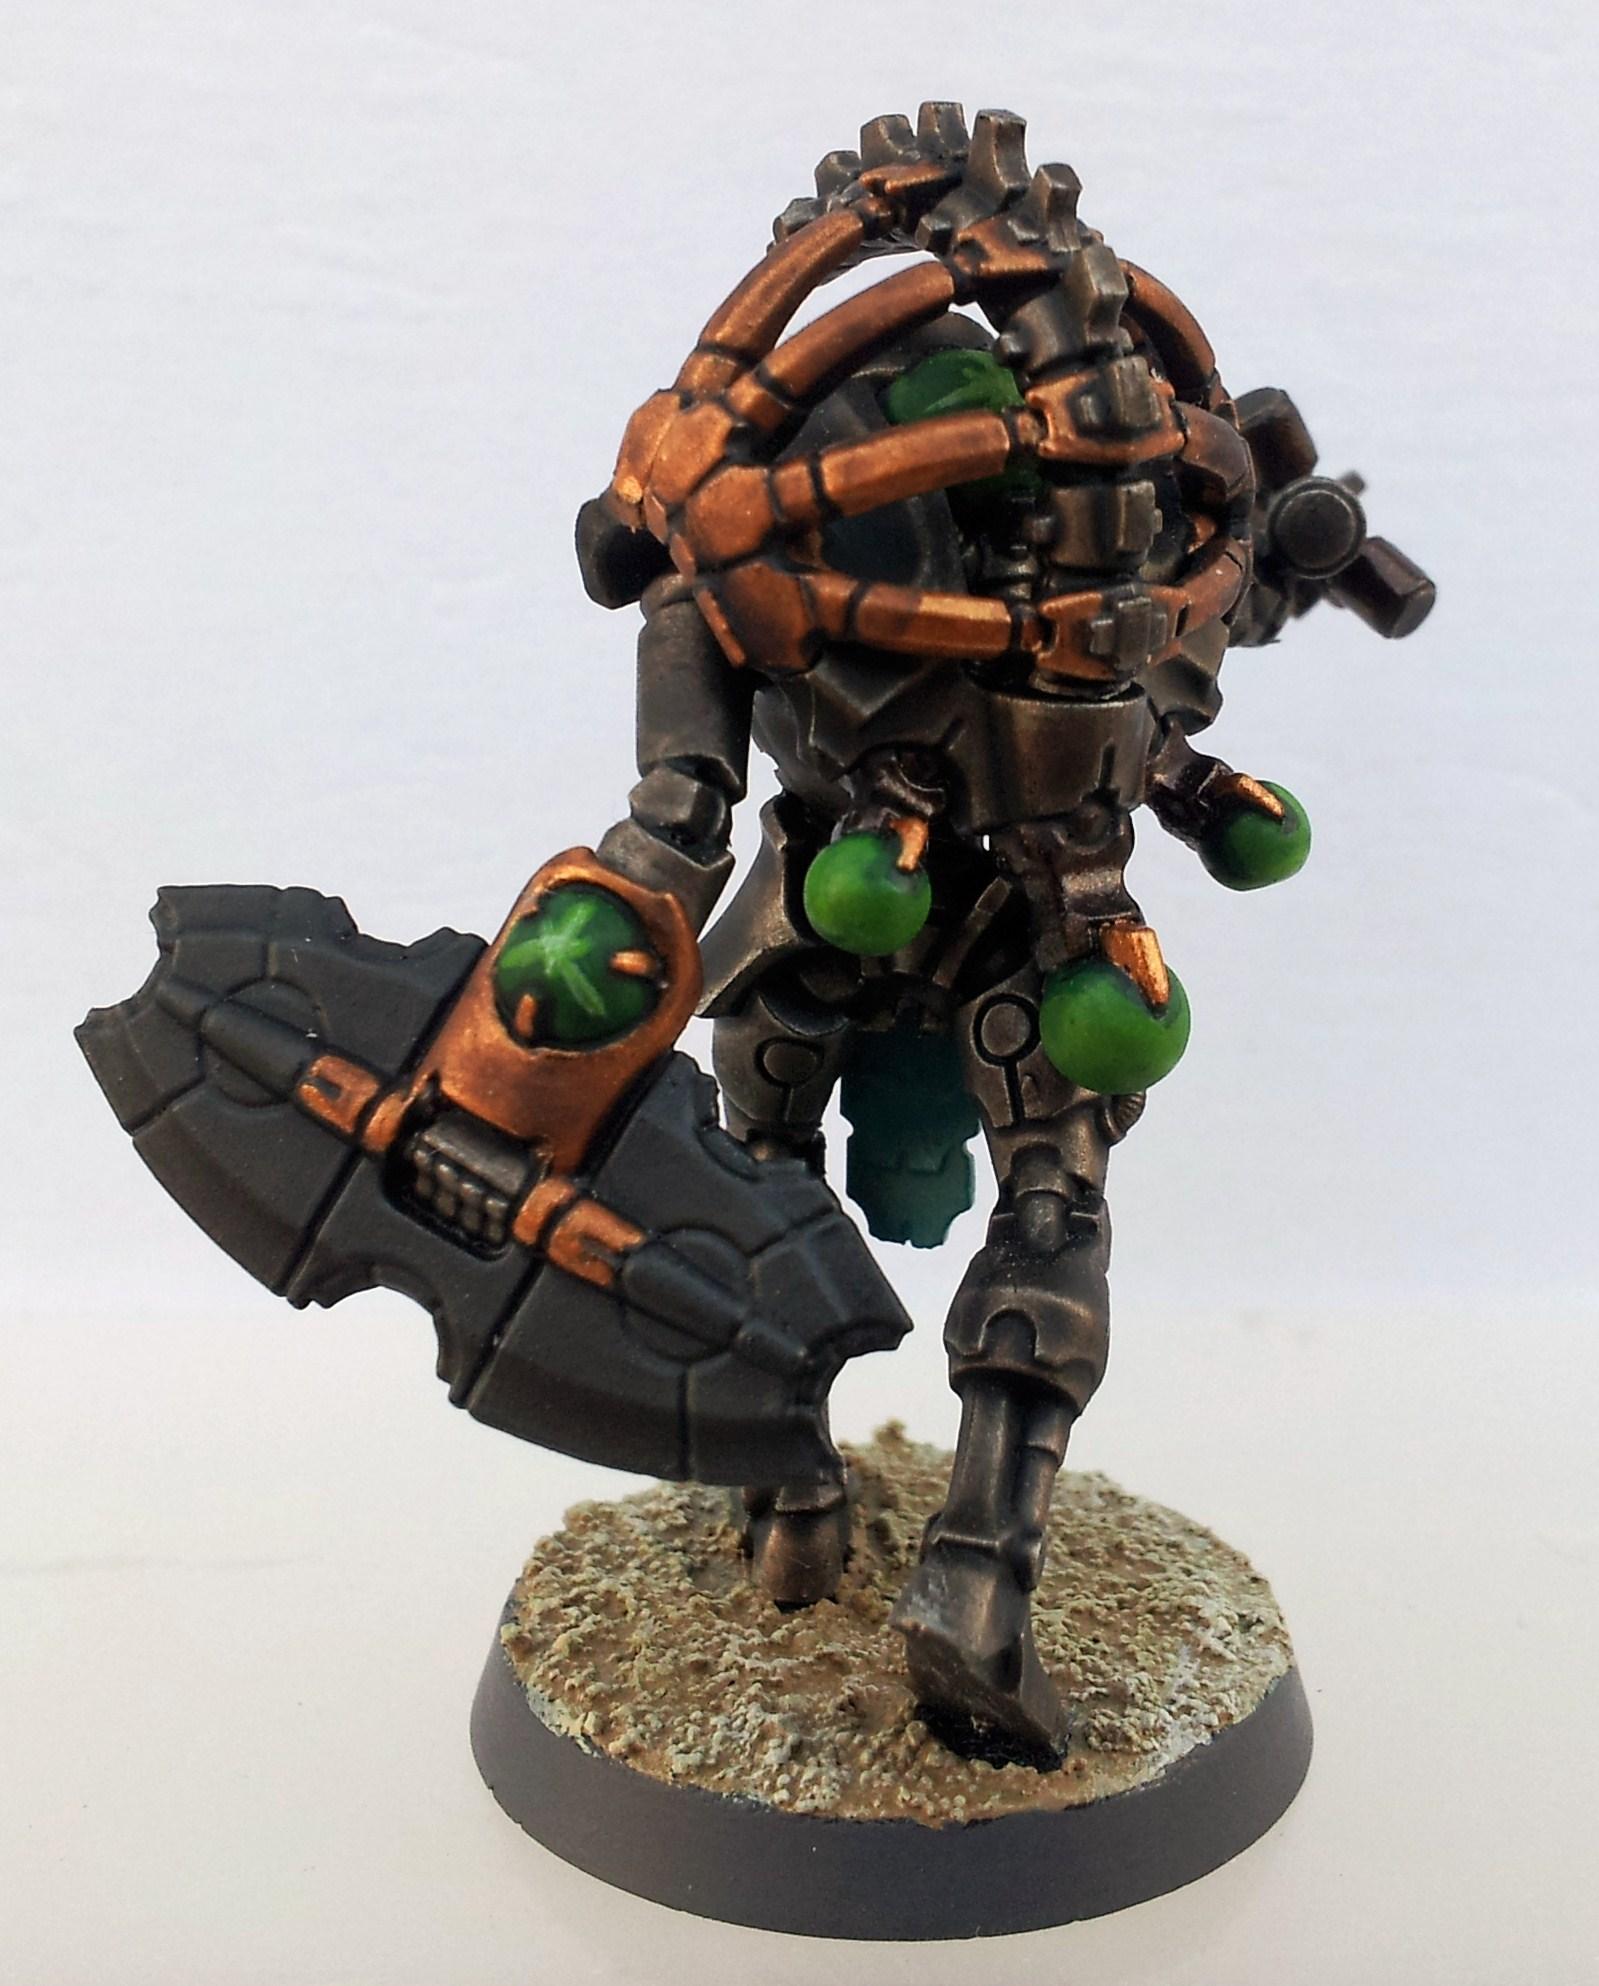 Necron Army Work in Progress pics: Triarch Praetorian Snake